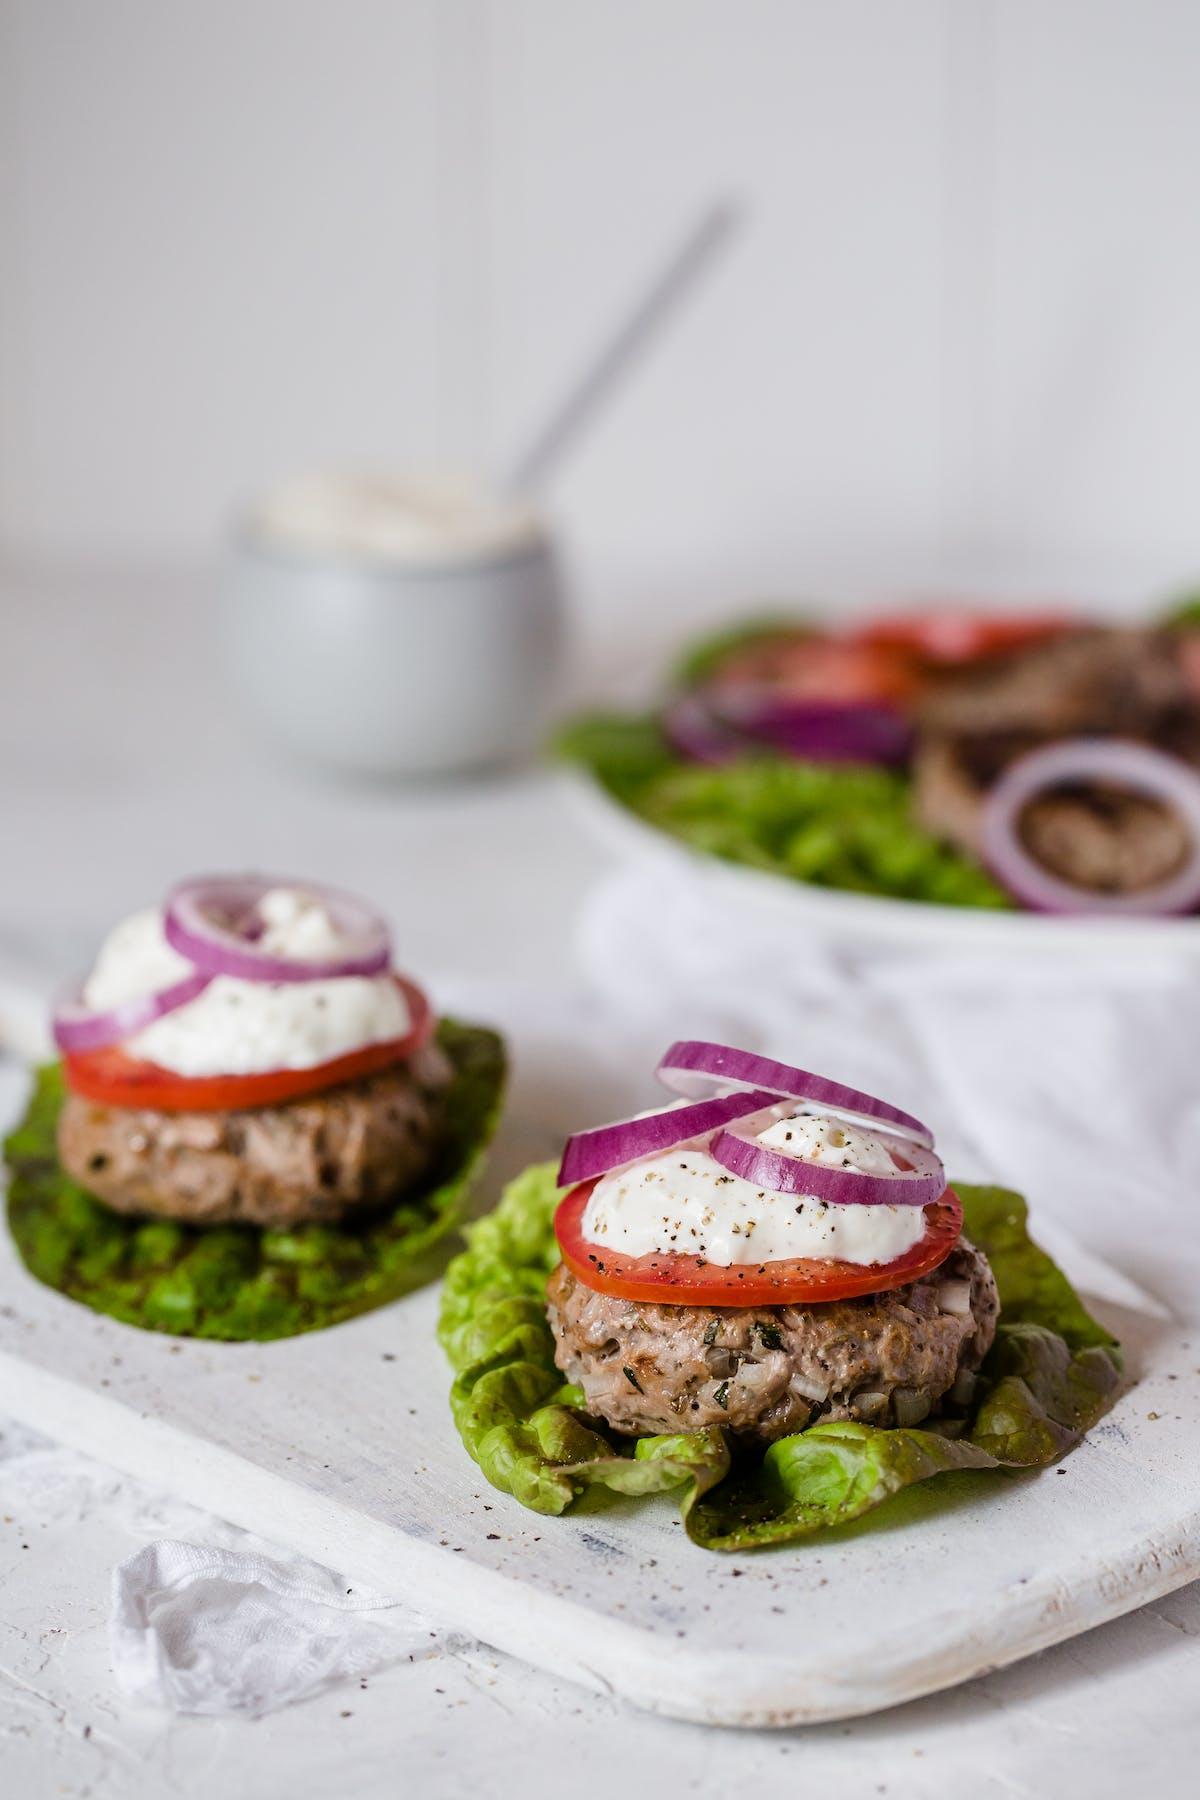 Mini hamburguesas de cordero con aderezo de queso feta